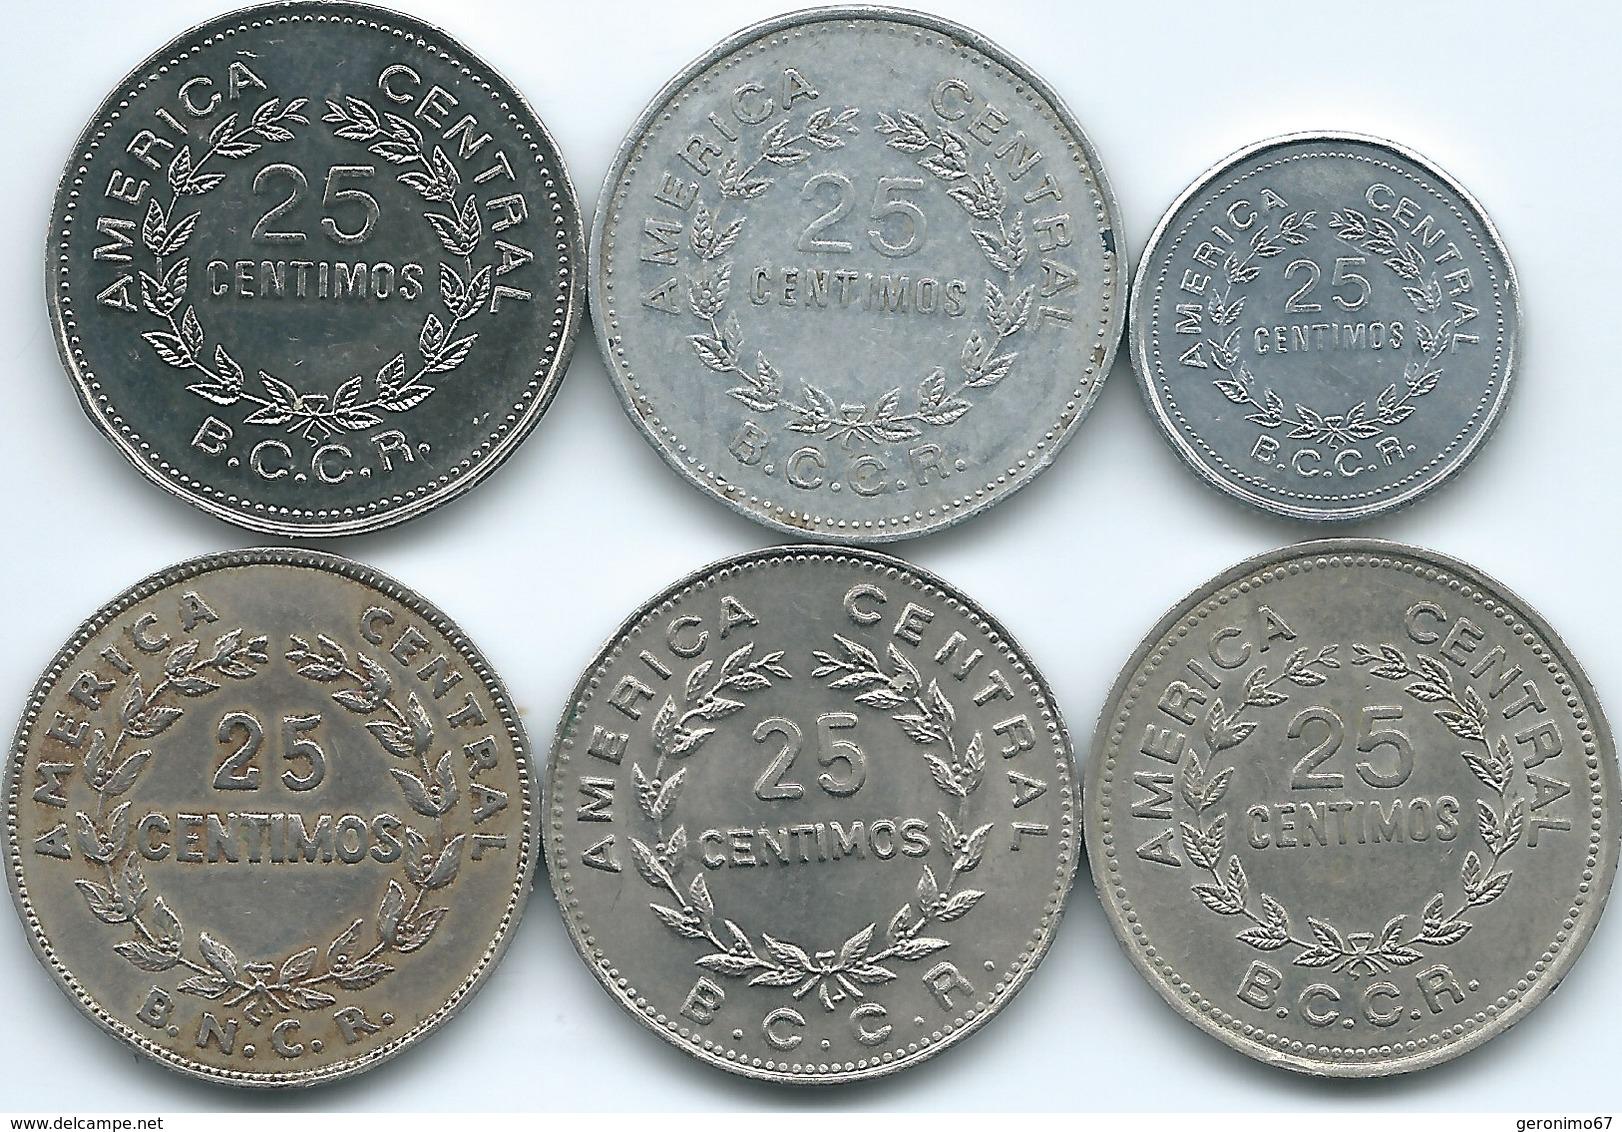 Costa Rica - 1948 - 25 Centimos (KM175) 1972 (KM188.2) 1978 (KM188.1) 1980 (KM188.1a) 1982 (KM188.1b) & 1983 (KM188.3) - Costa Rica